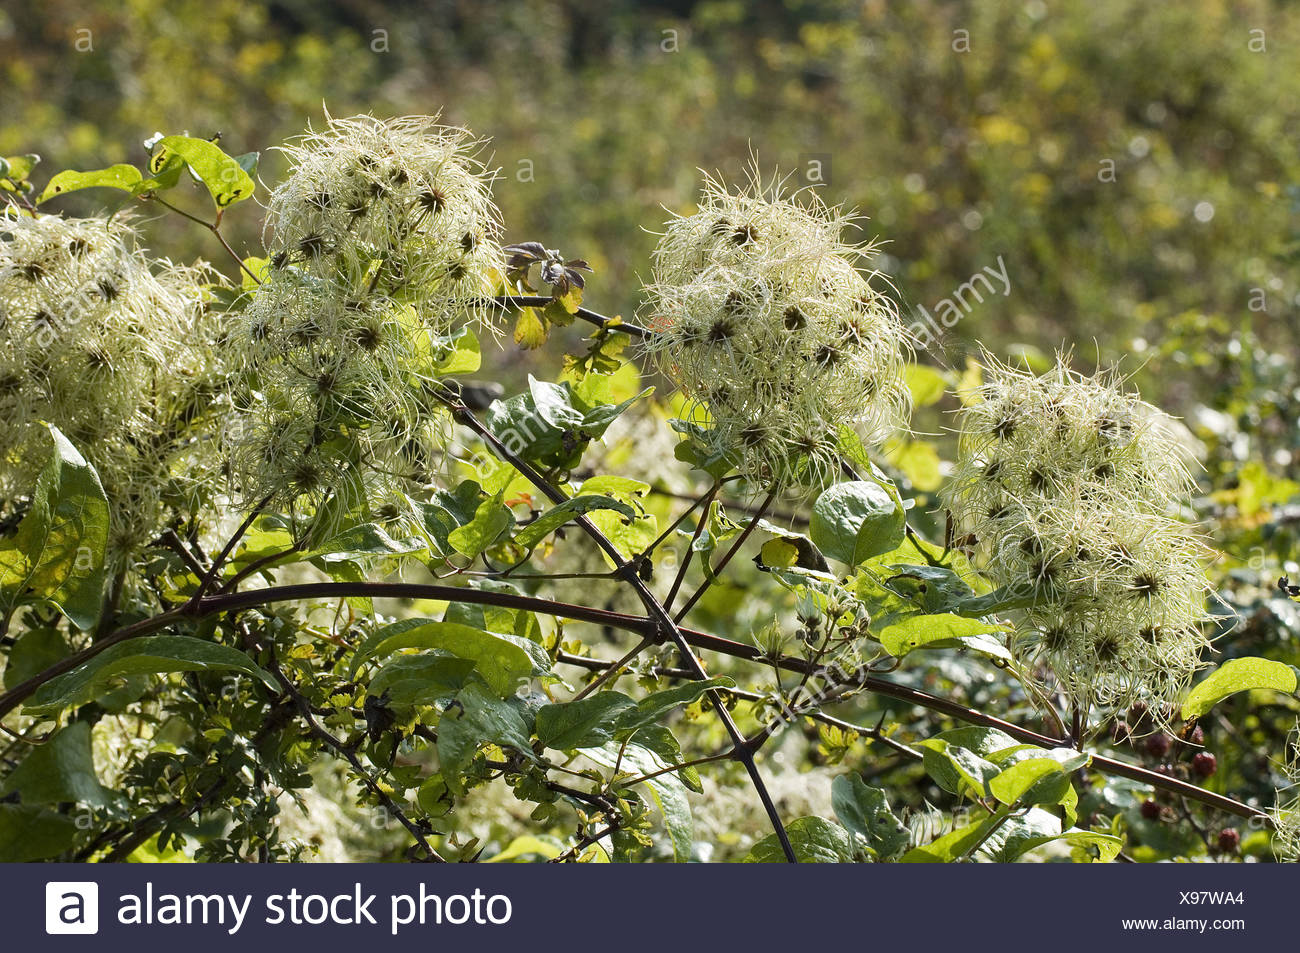 shrub shrubs plant plants europe european 'old man's beard' 'travellers joy' 'traveller's joy' climber climbers ranunculaceae - Stock Image